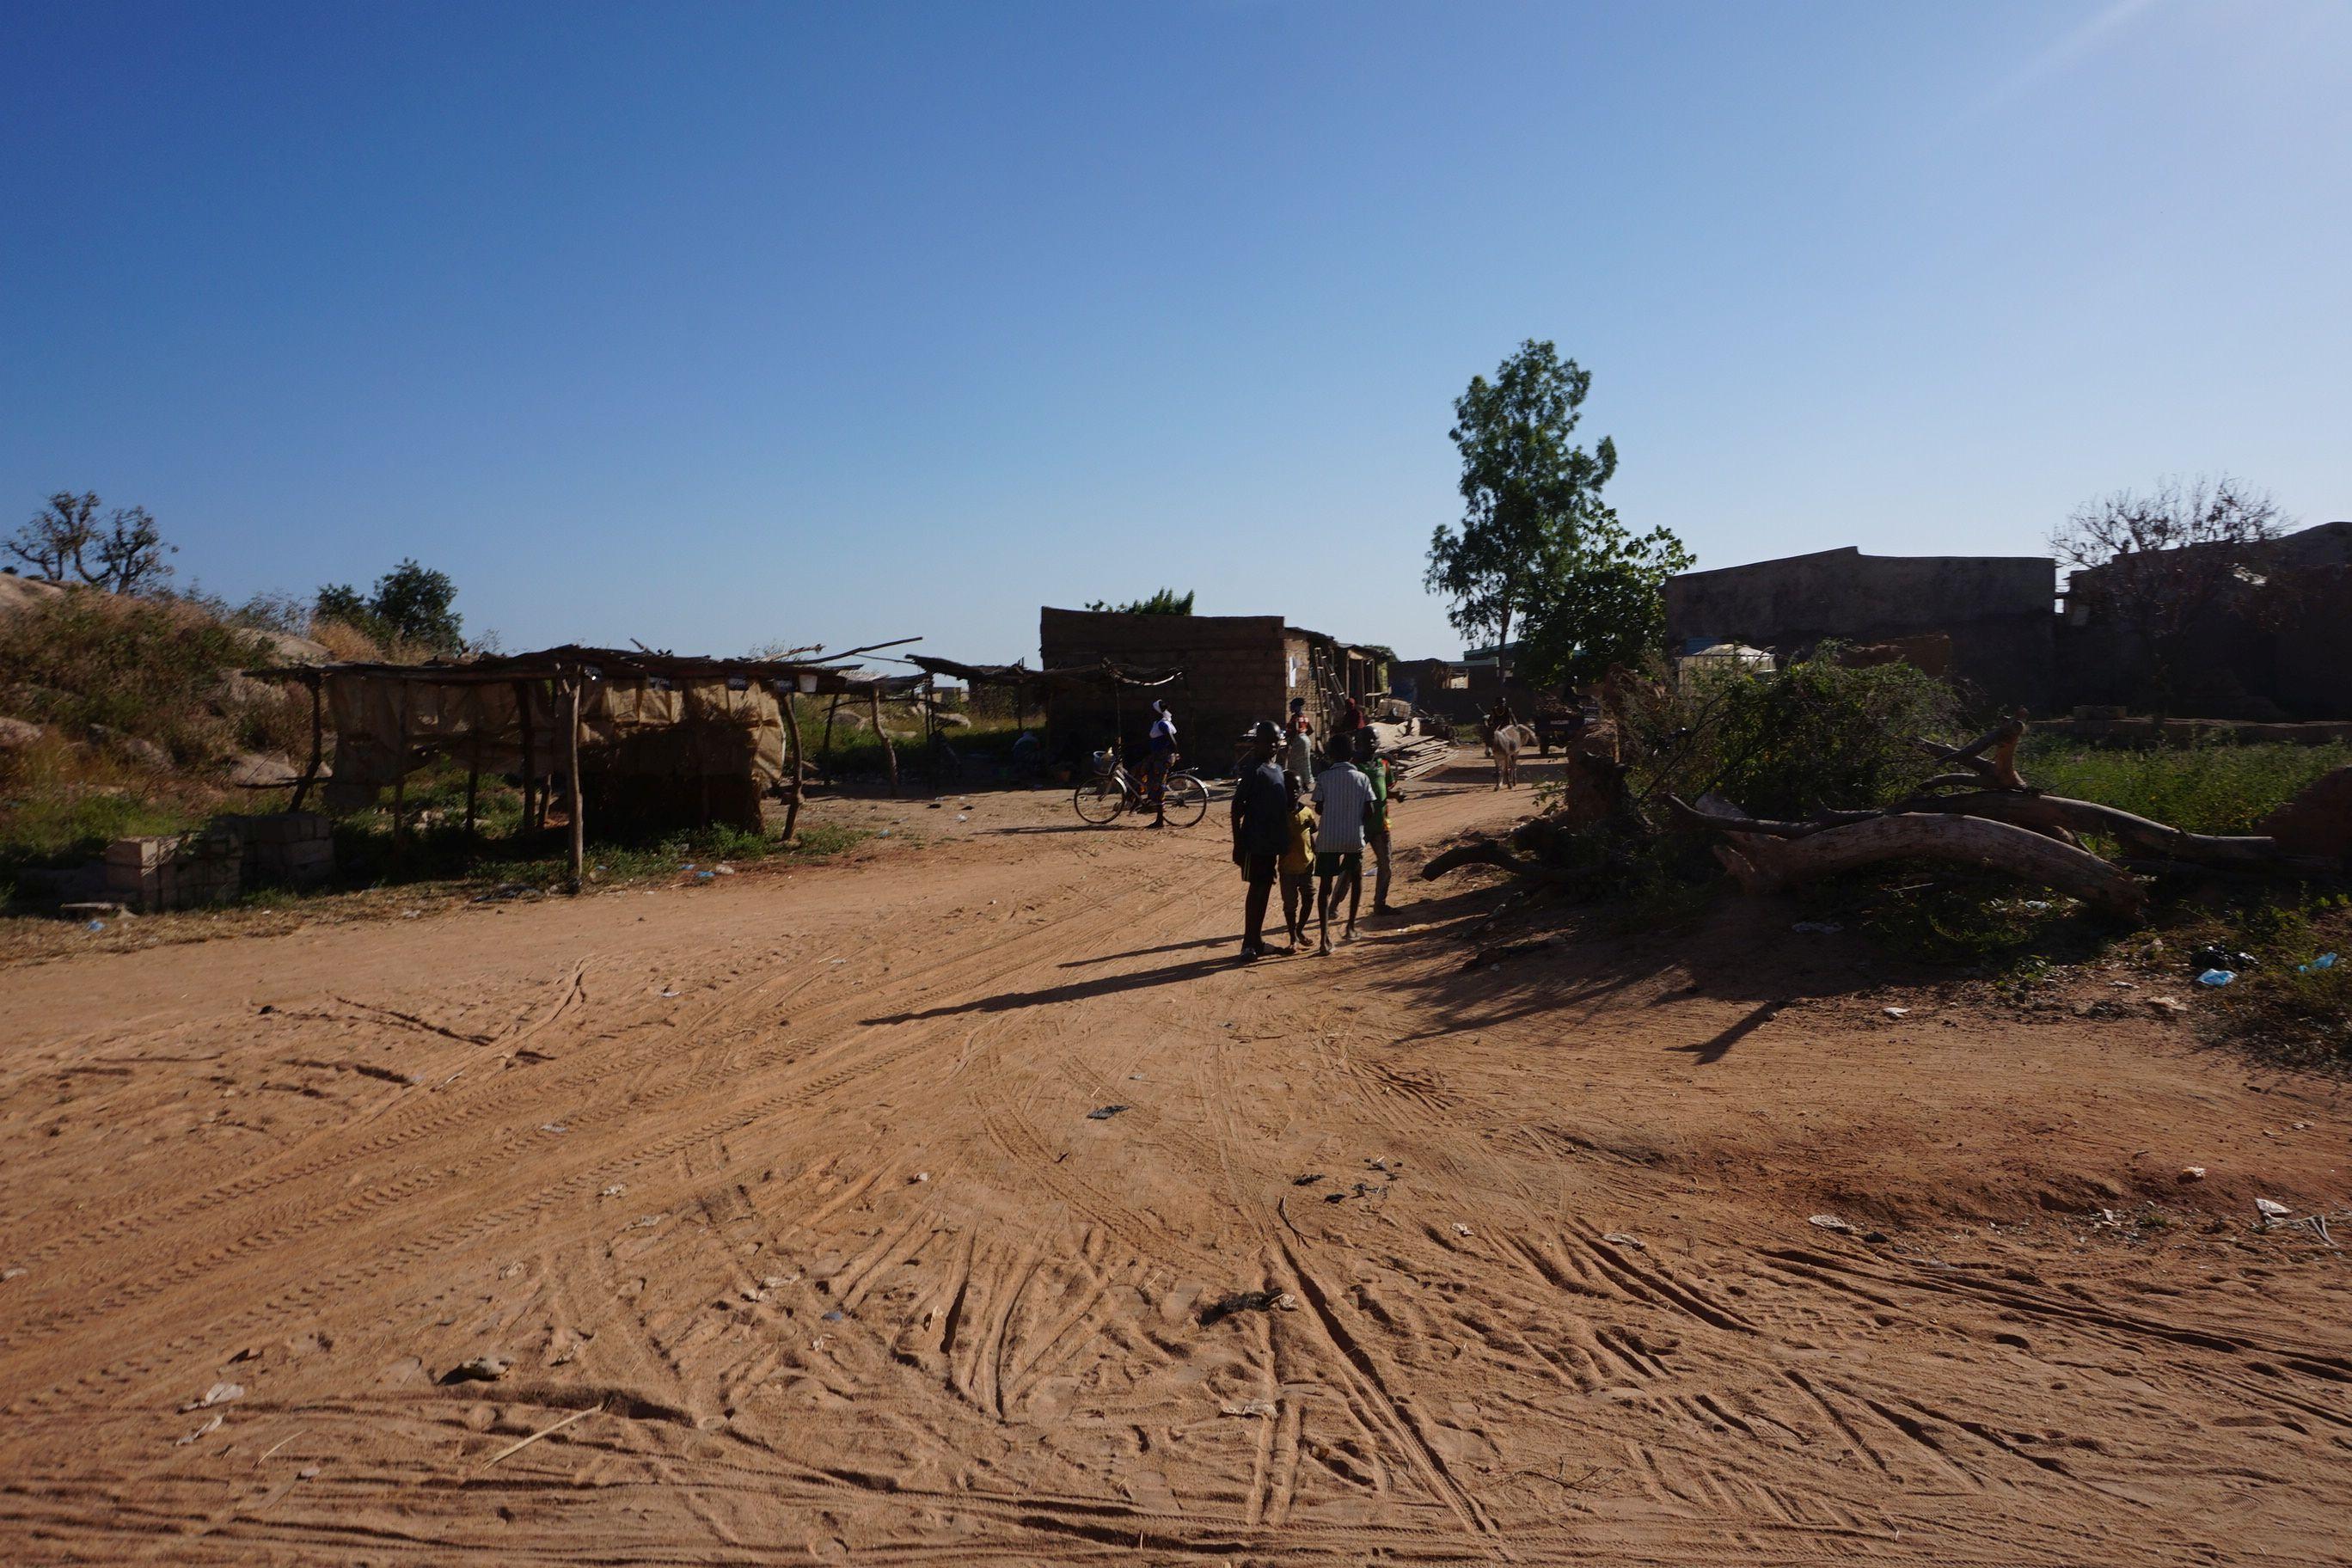 Village in Burkina Faso